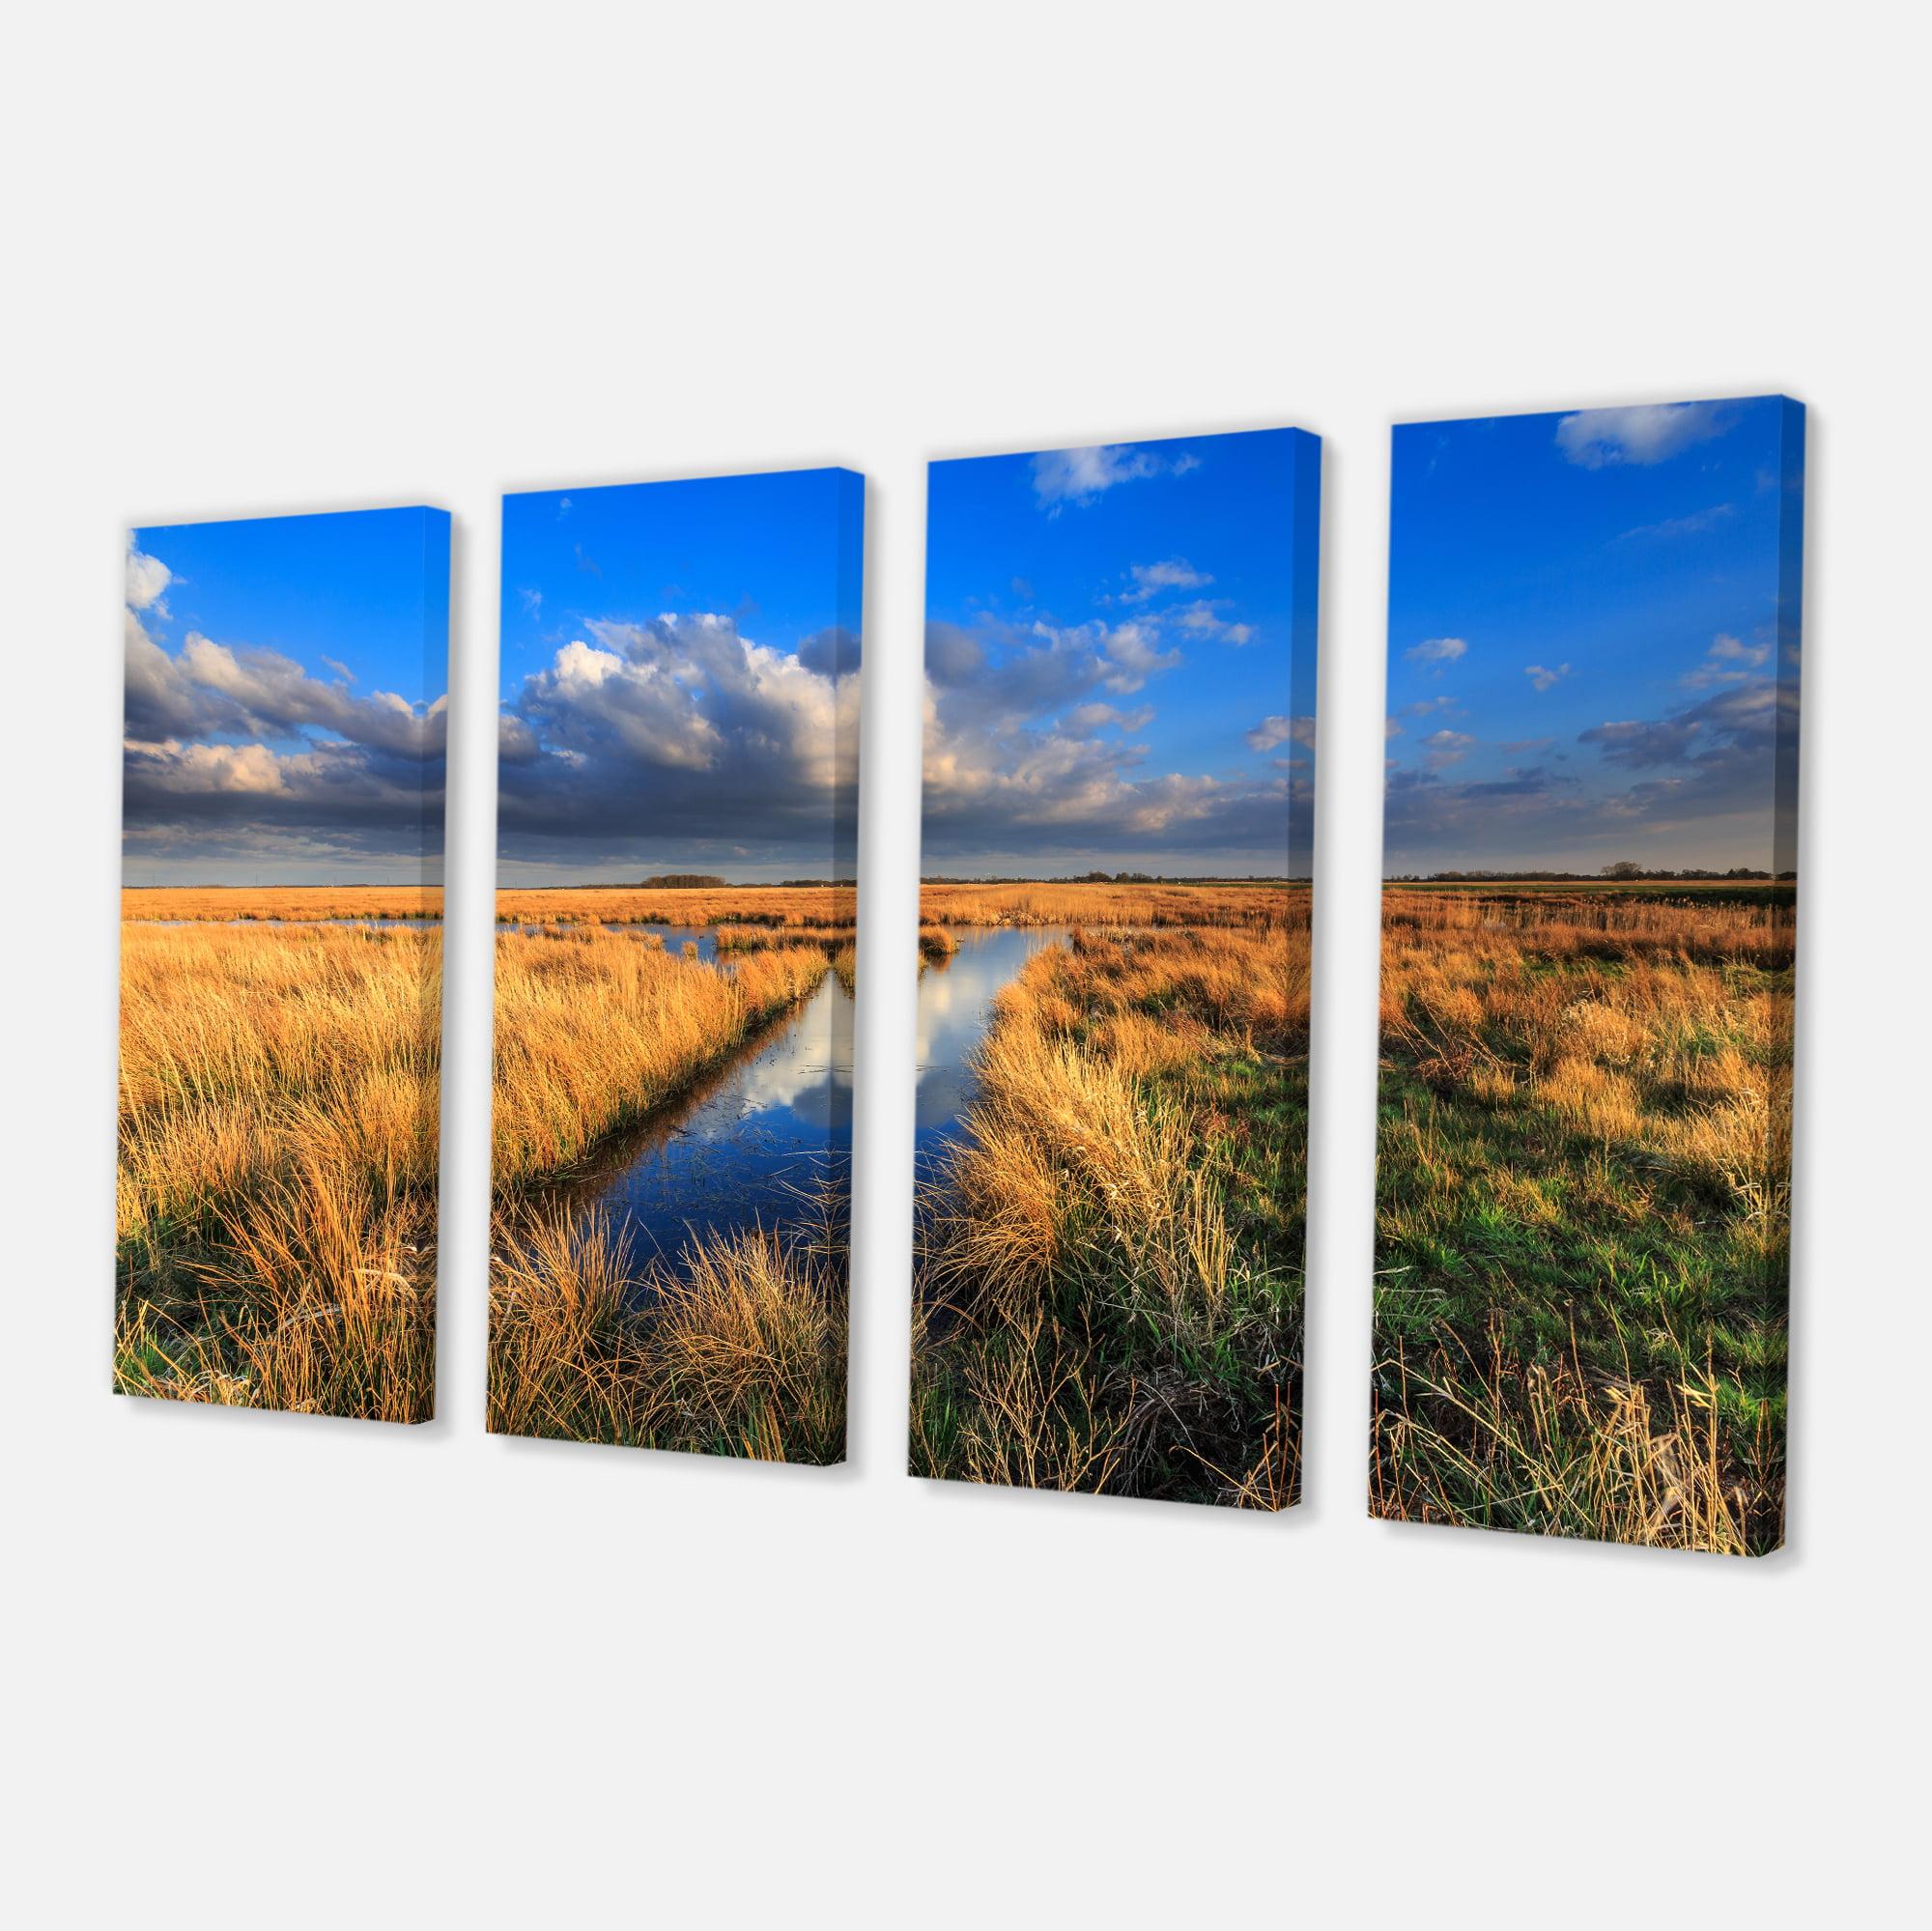 Meadow Land with Beautiful Skyscrapers - Landscape Canvas Art Print - image 2 de 3